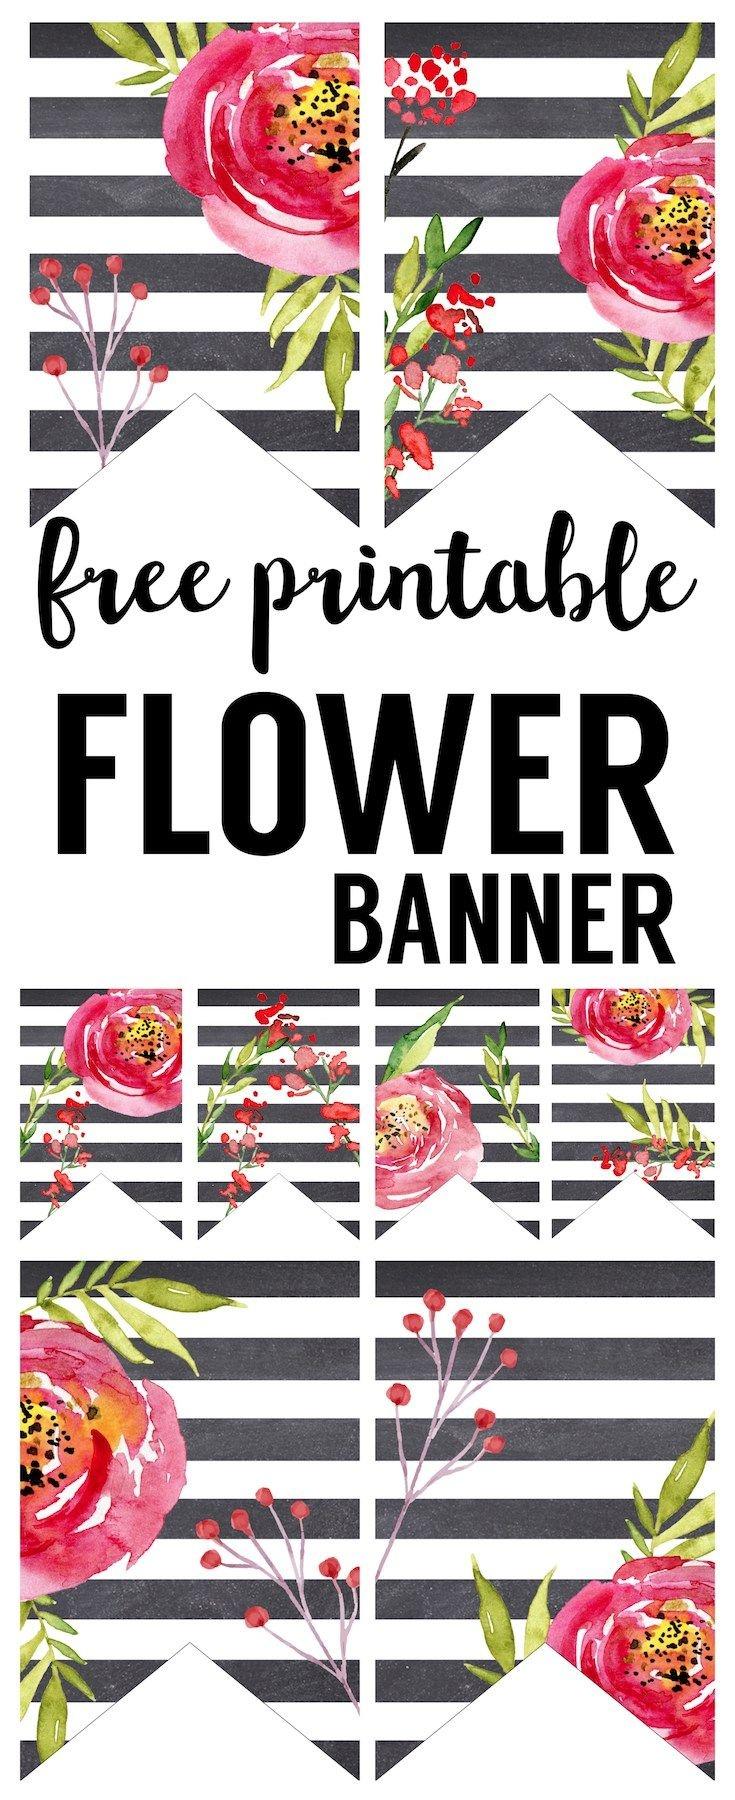 Watercolor Flower Banner Free Printable | Planner Printables - Free Printable Wedding Decorations